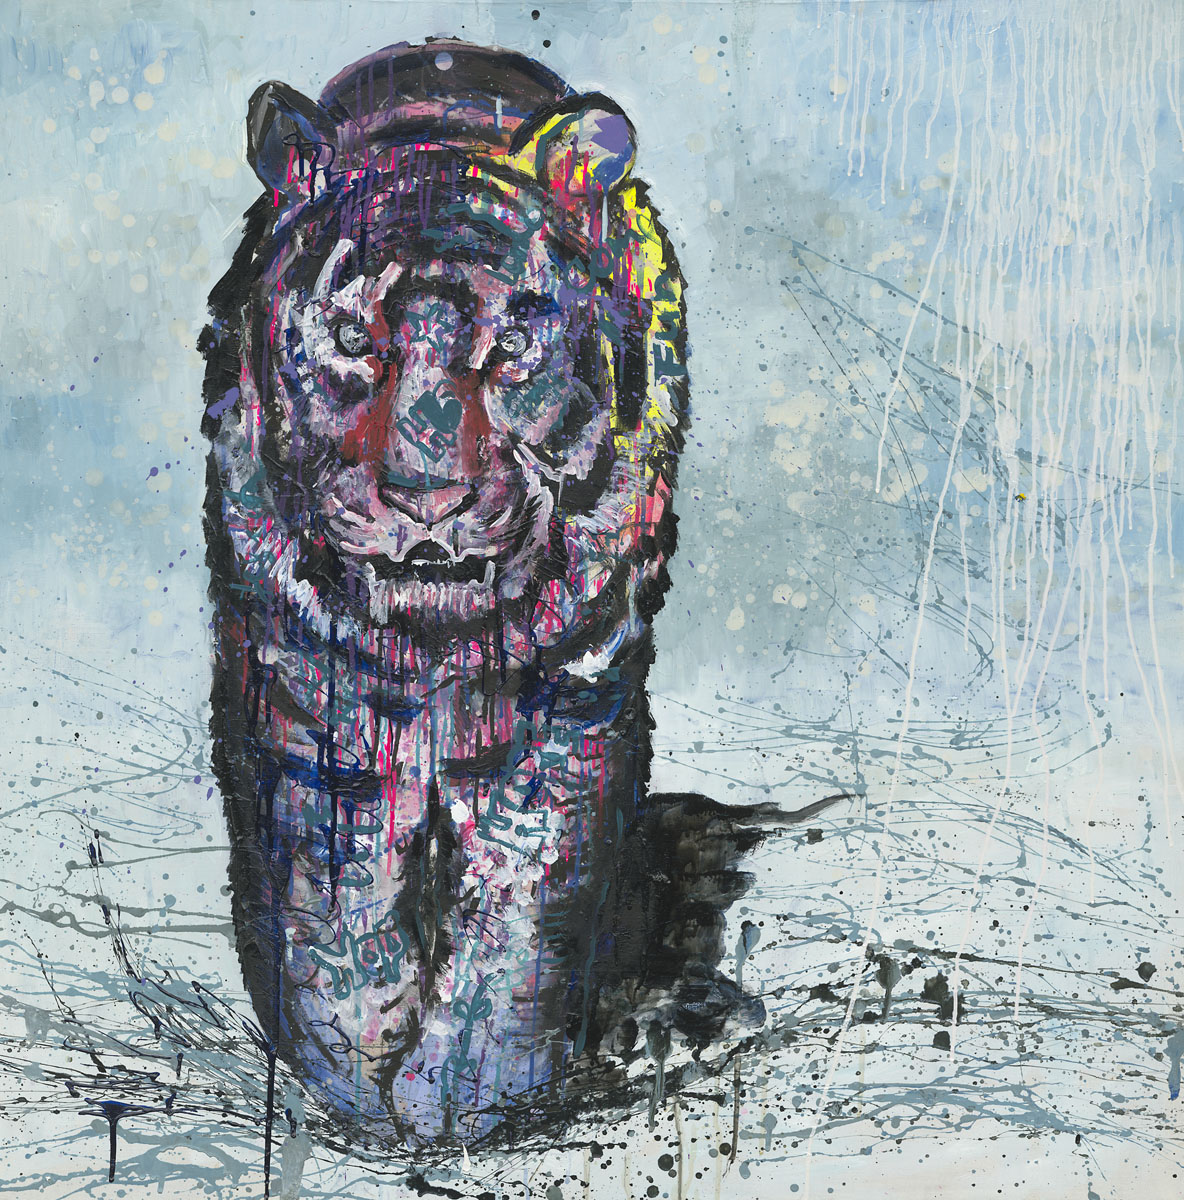 Amur tiger, by Katya Krasnaya